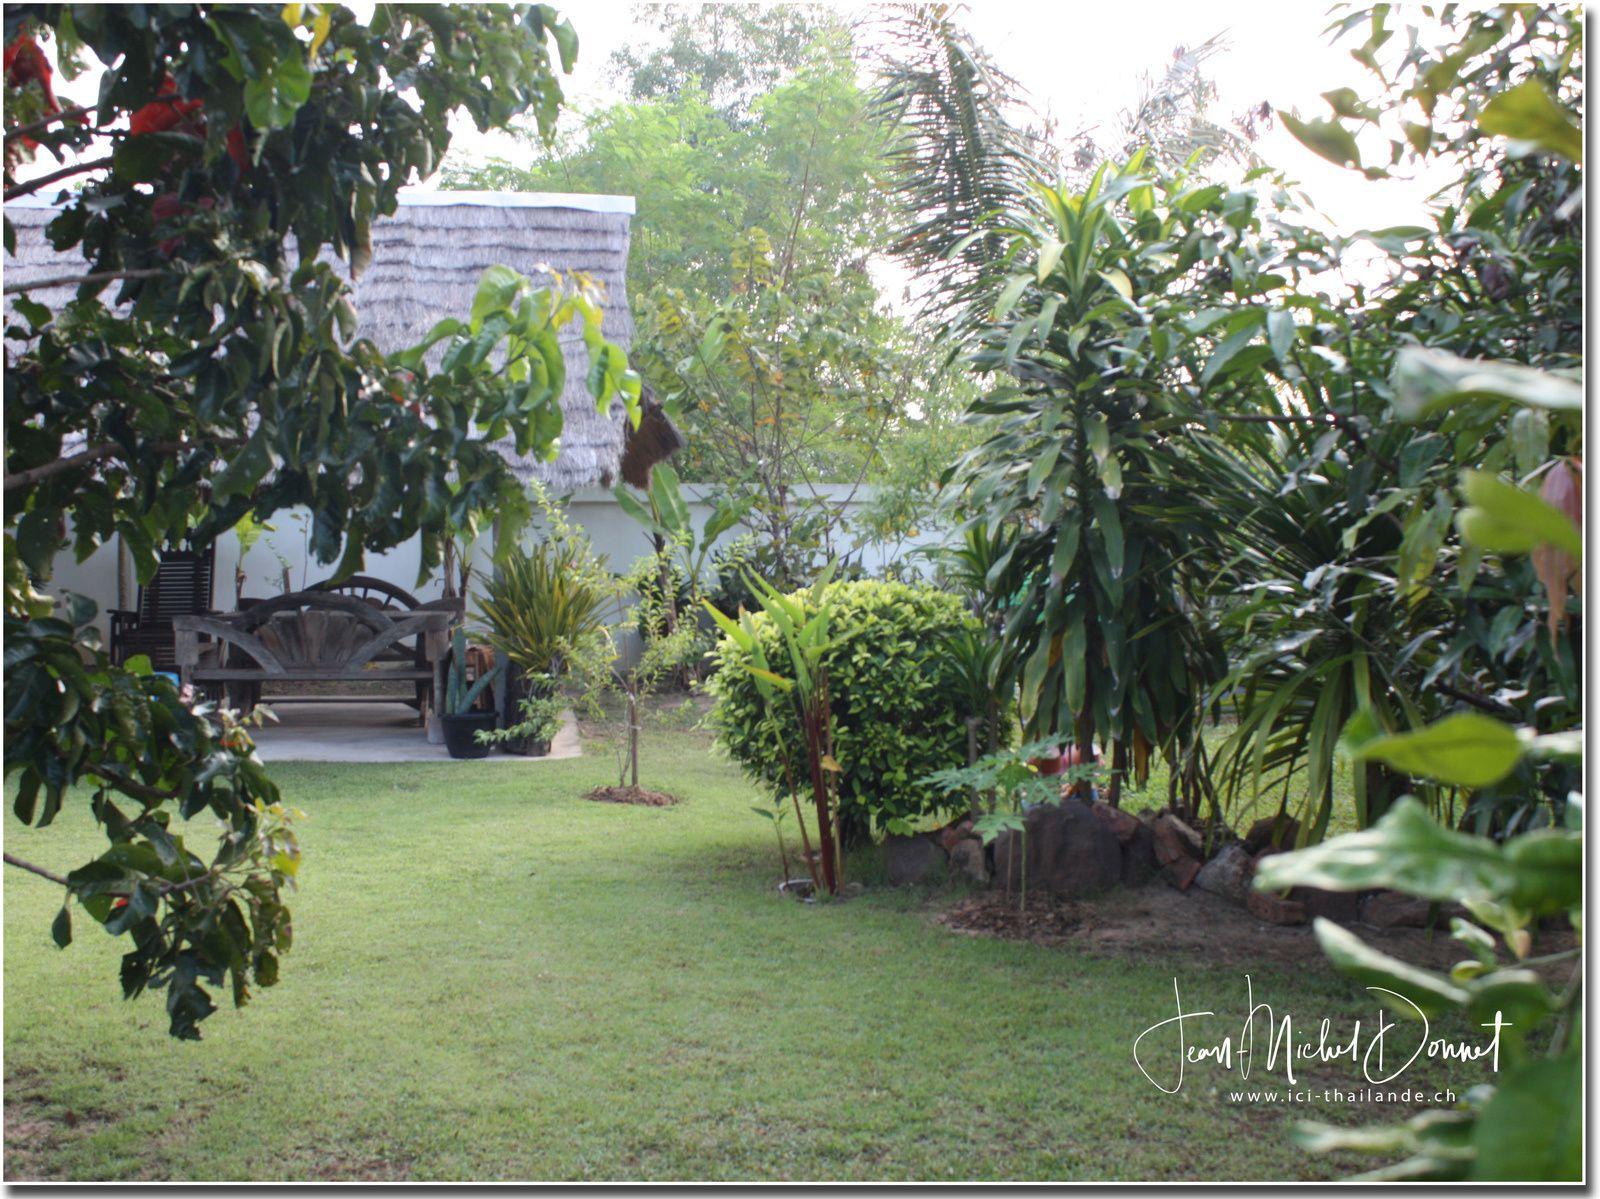 Potager et jardin (Khon Kaen, Thaïlande)